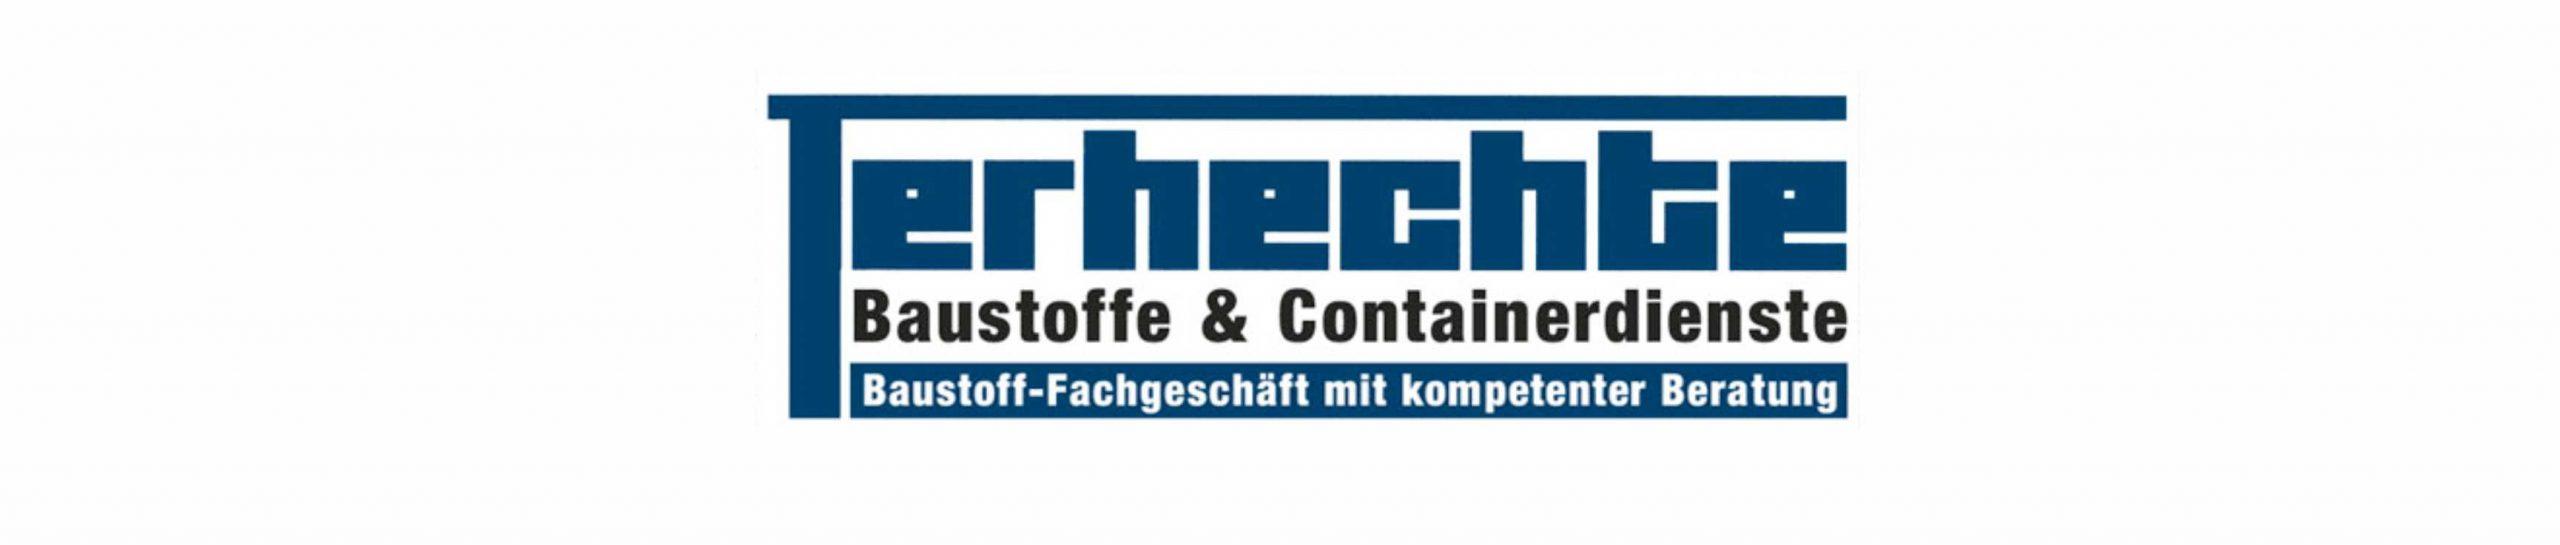 Gebr. Terhechte GmbH Baustoffe - Stadltohn